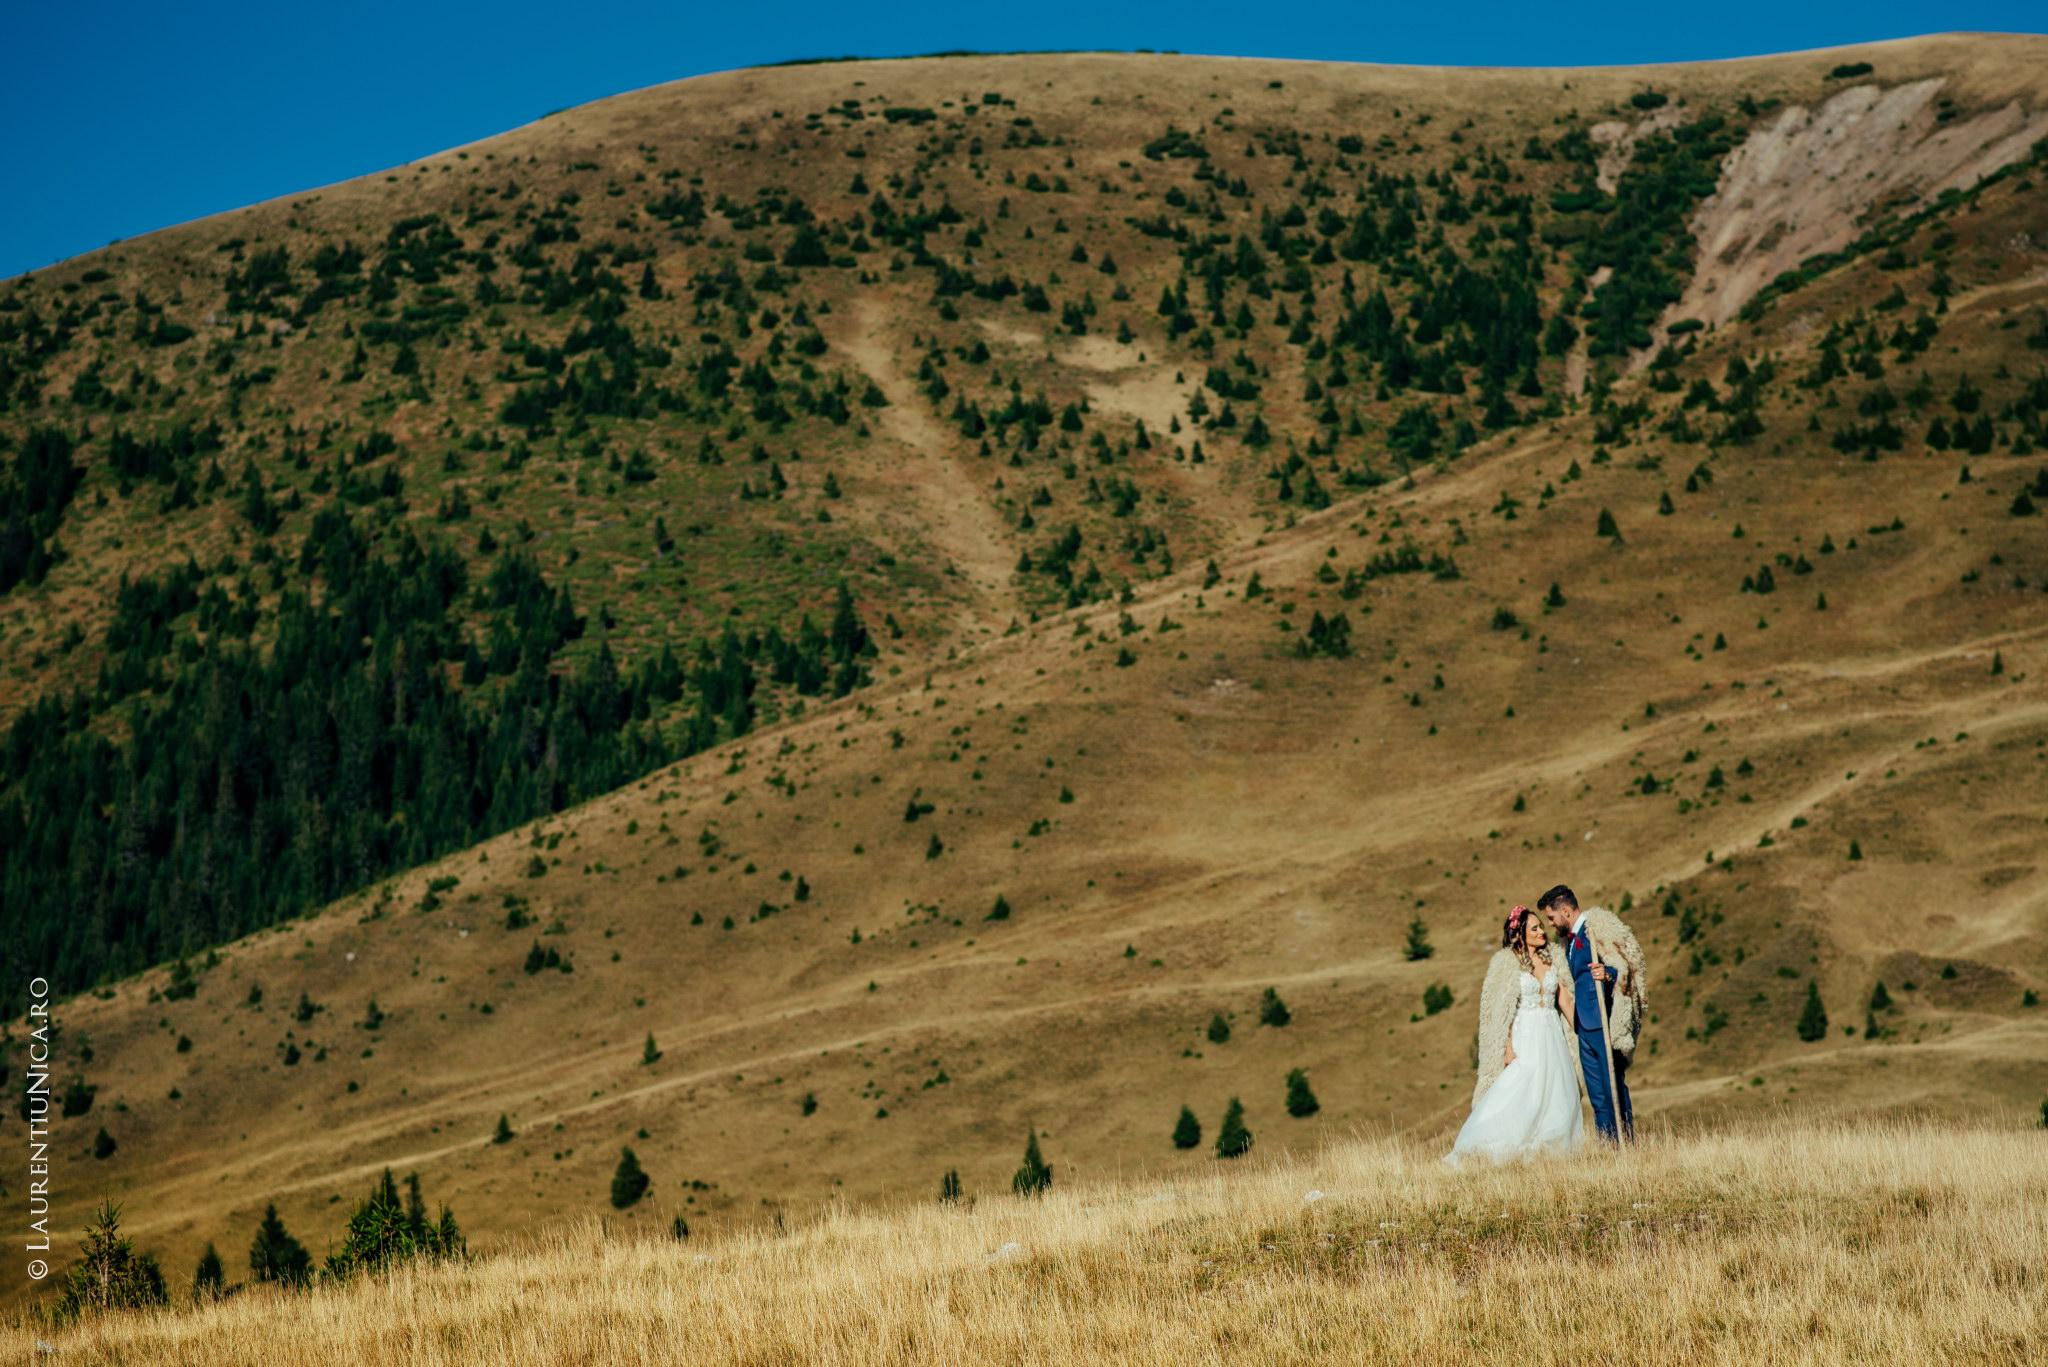 aida si alin fotograf nunta laurentiu nica transalpina 06 - Aida & Alin | Fotografii After Wedding | Transalpina - Muntii Parang